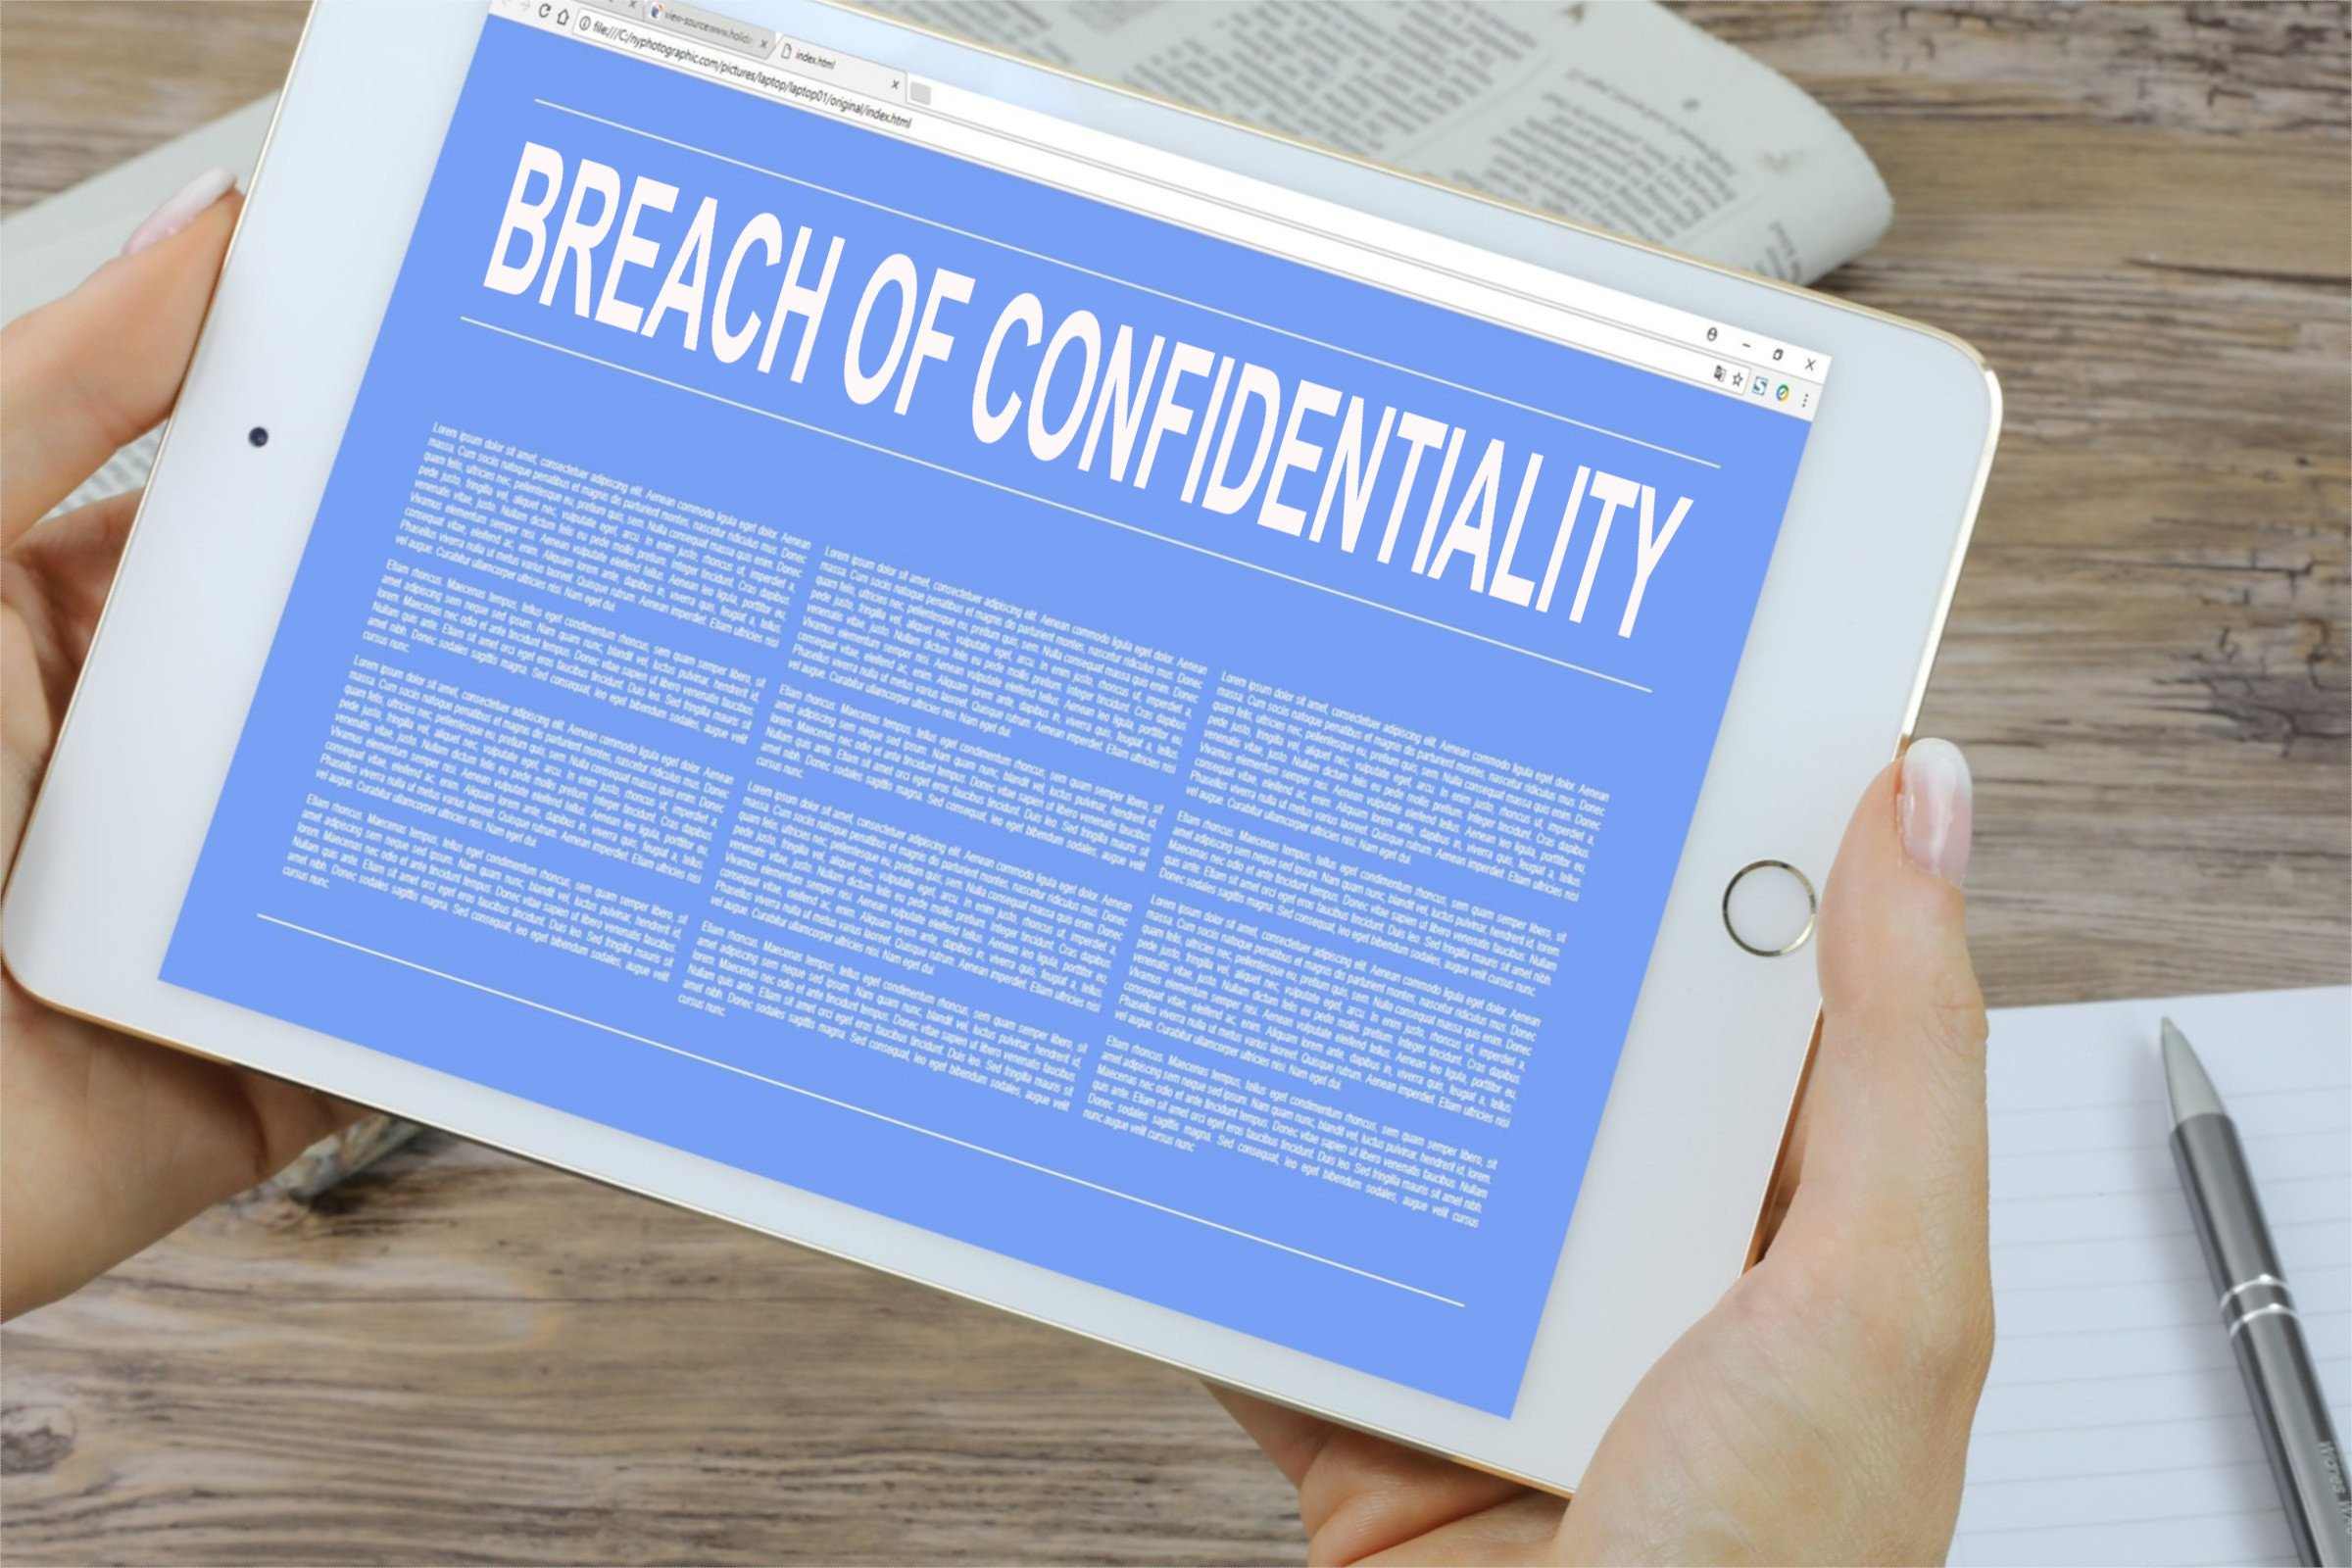 Breach of Confidentiality